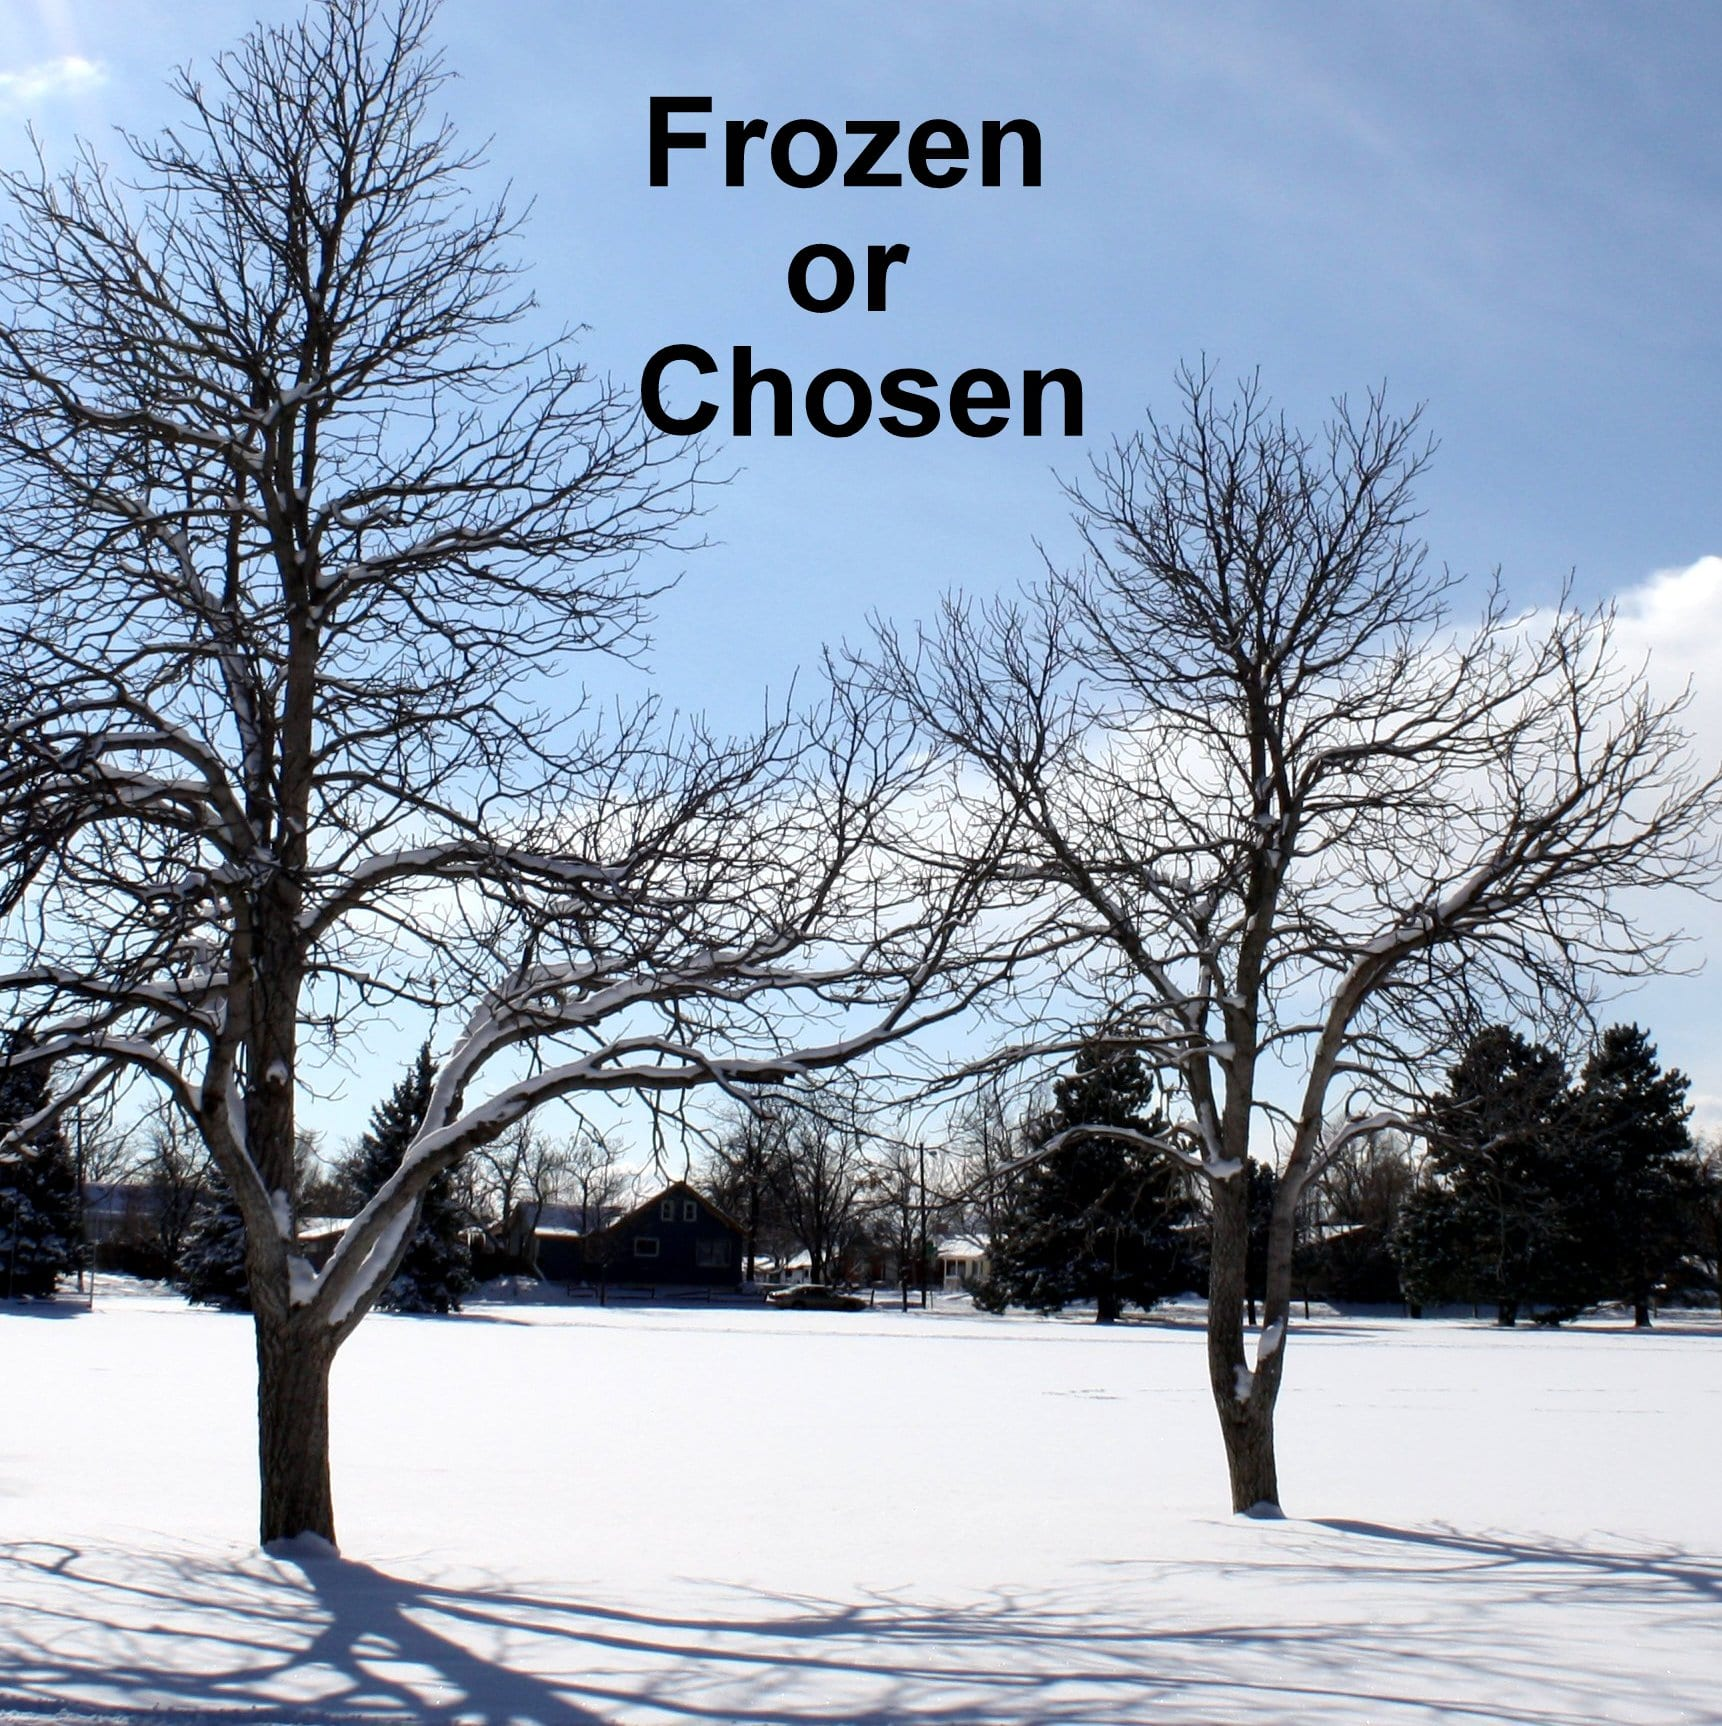 Frozen Chosen!